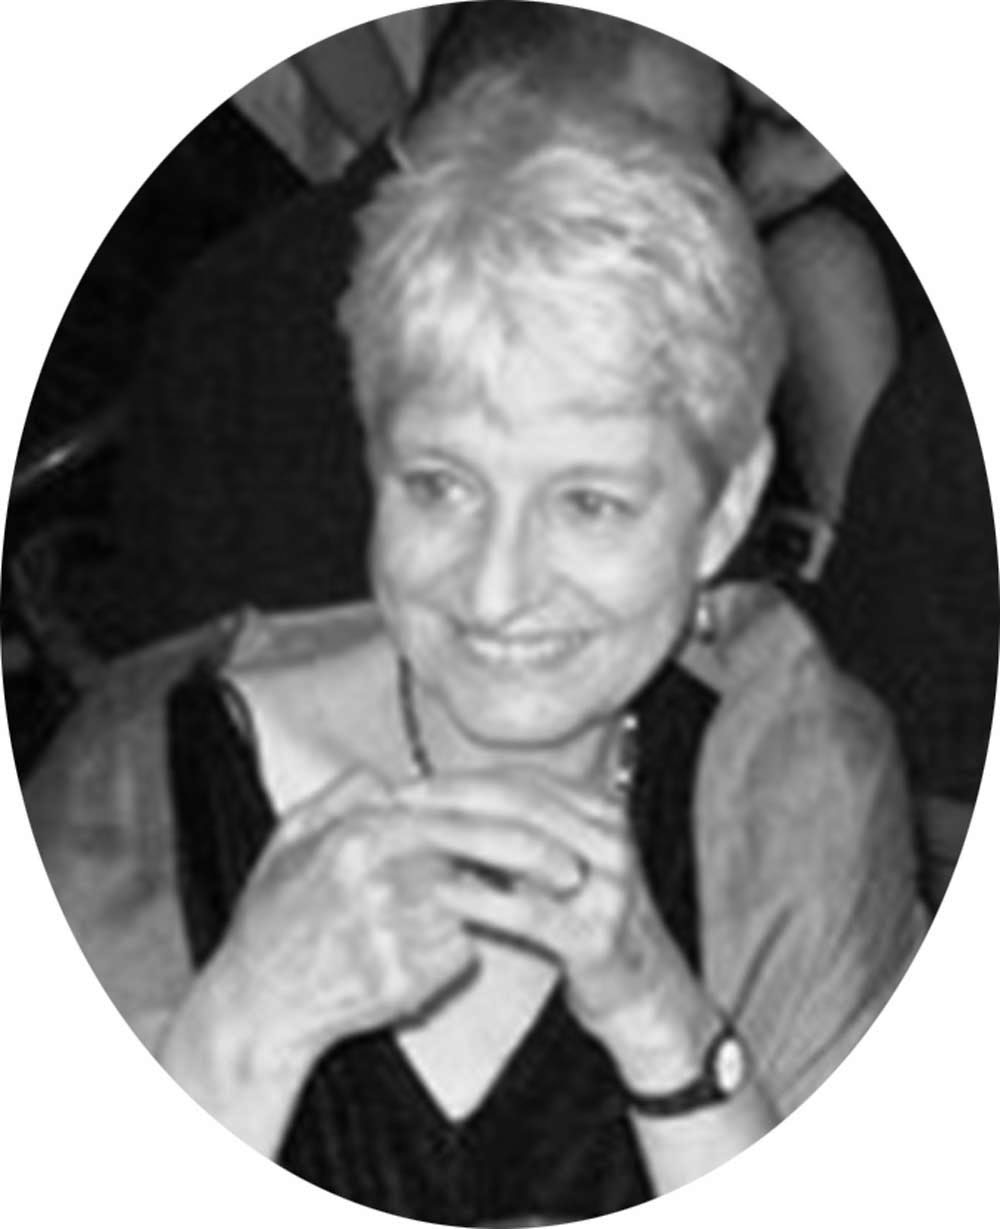 Claire Krähenbühl